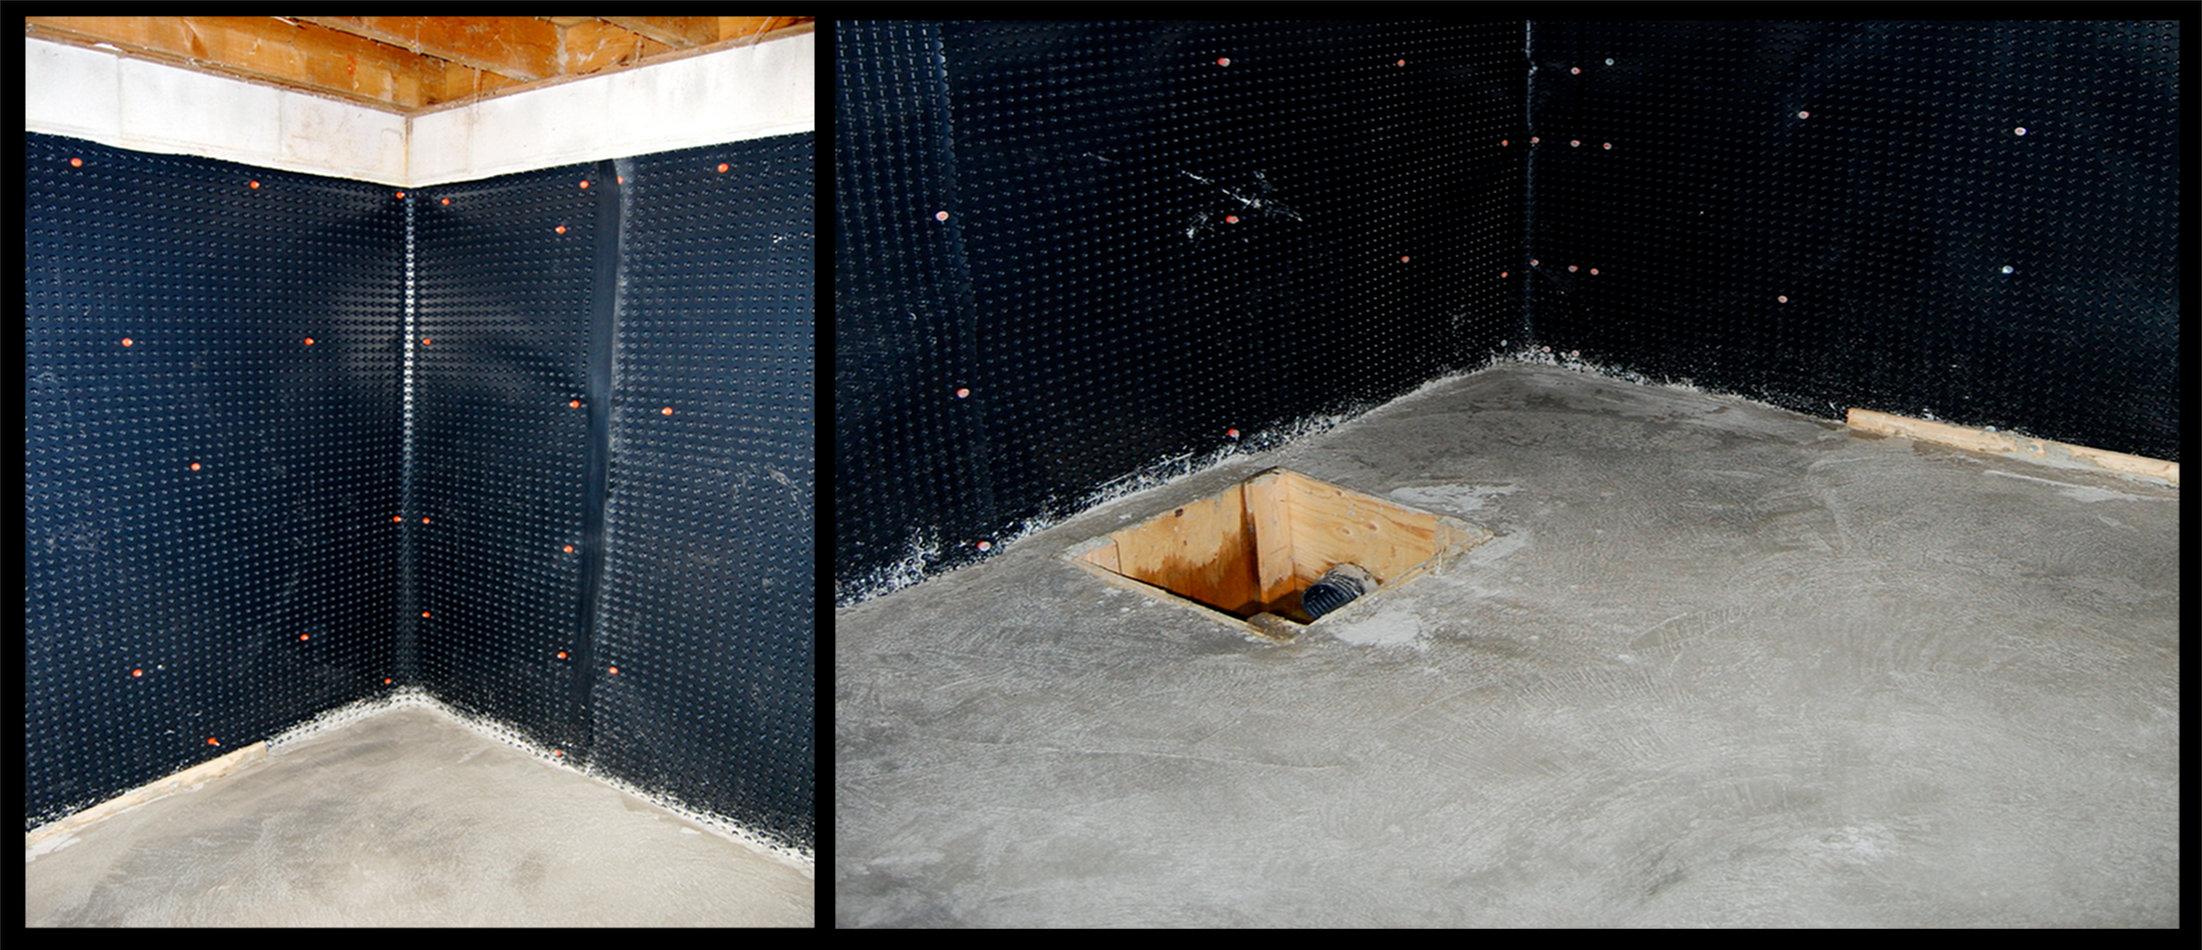 Гидроизоляция гаража изнутри своими руками 41